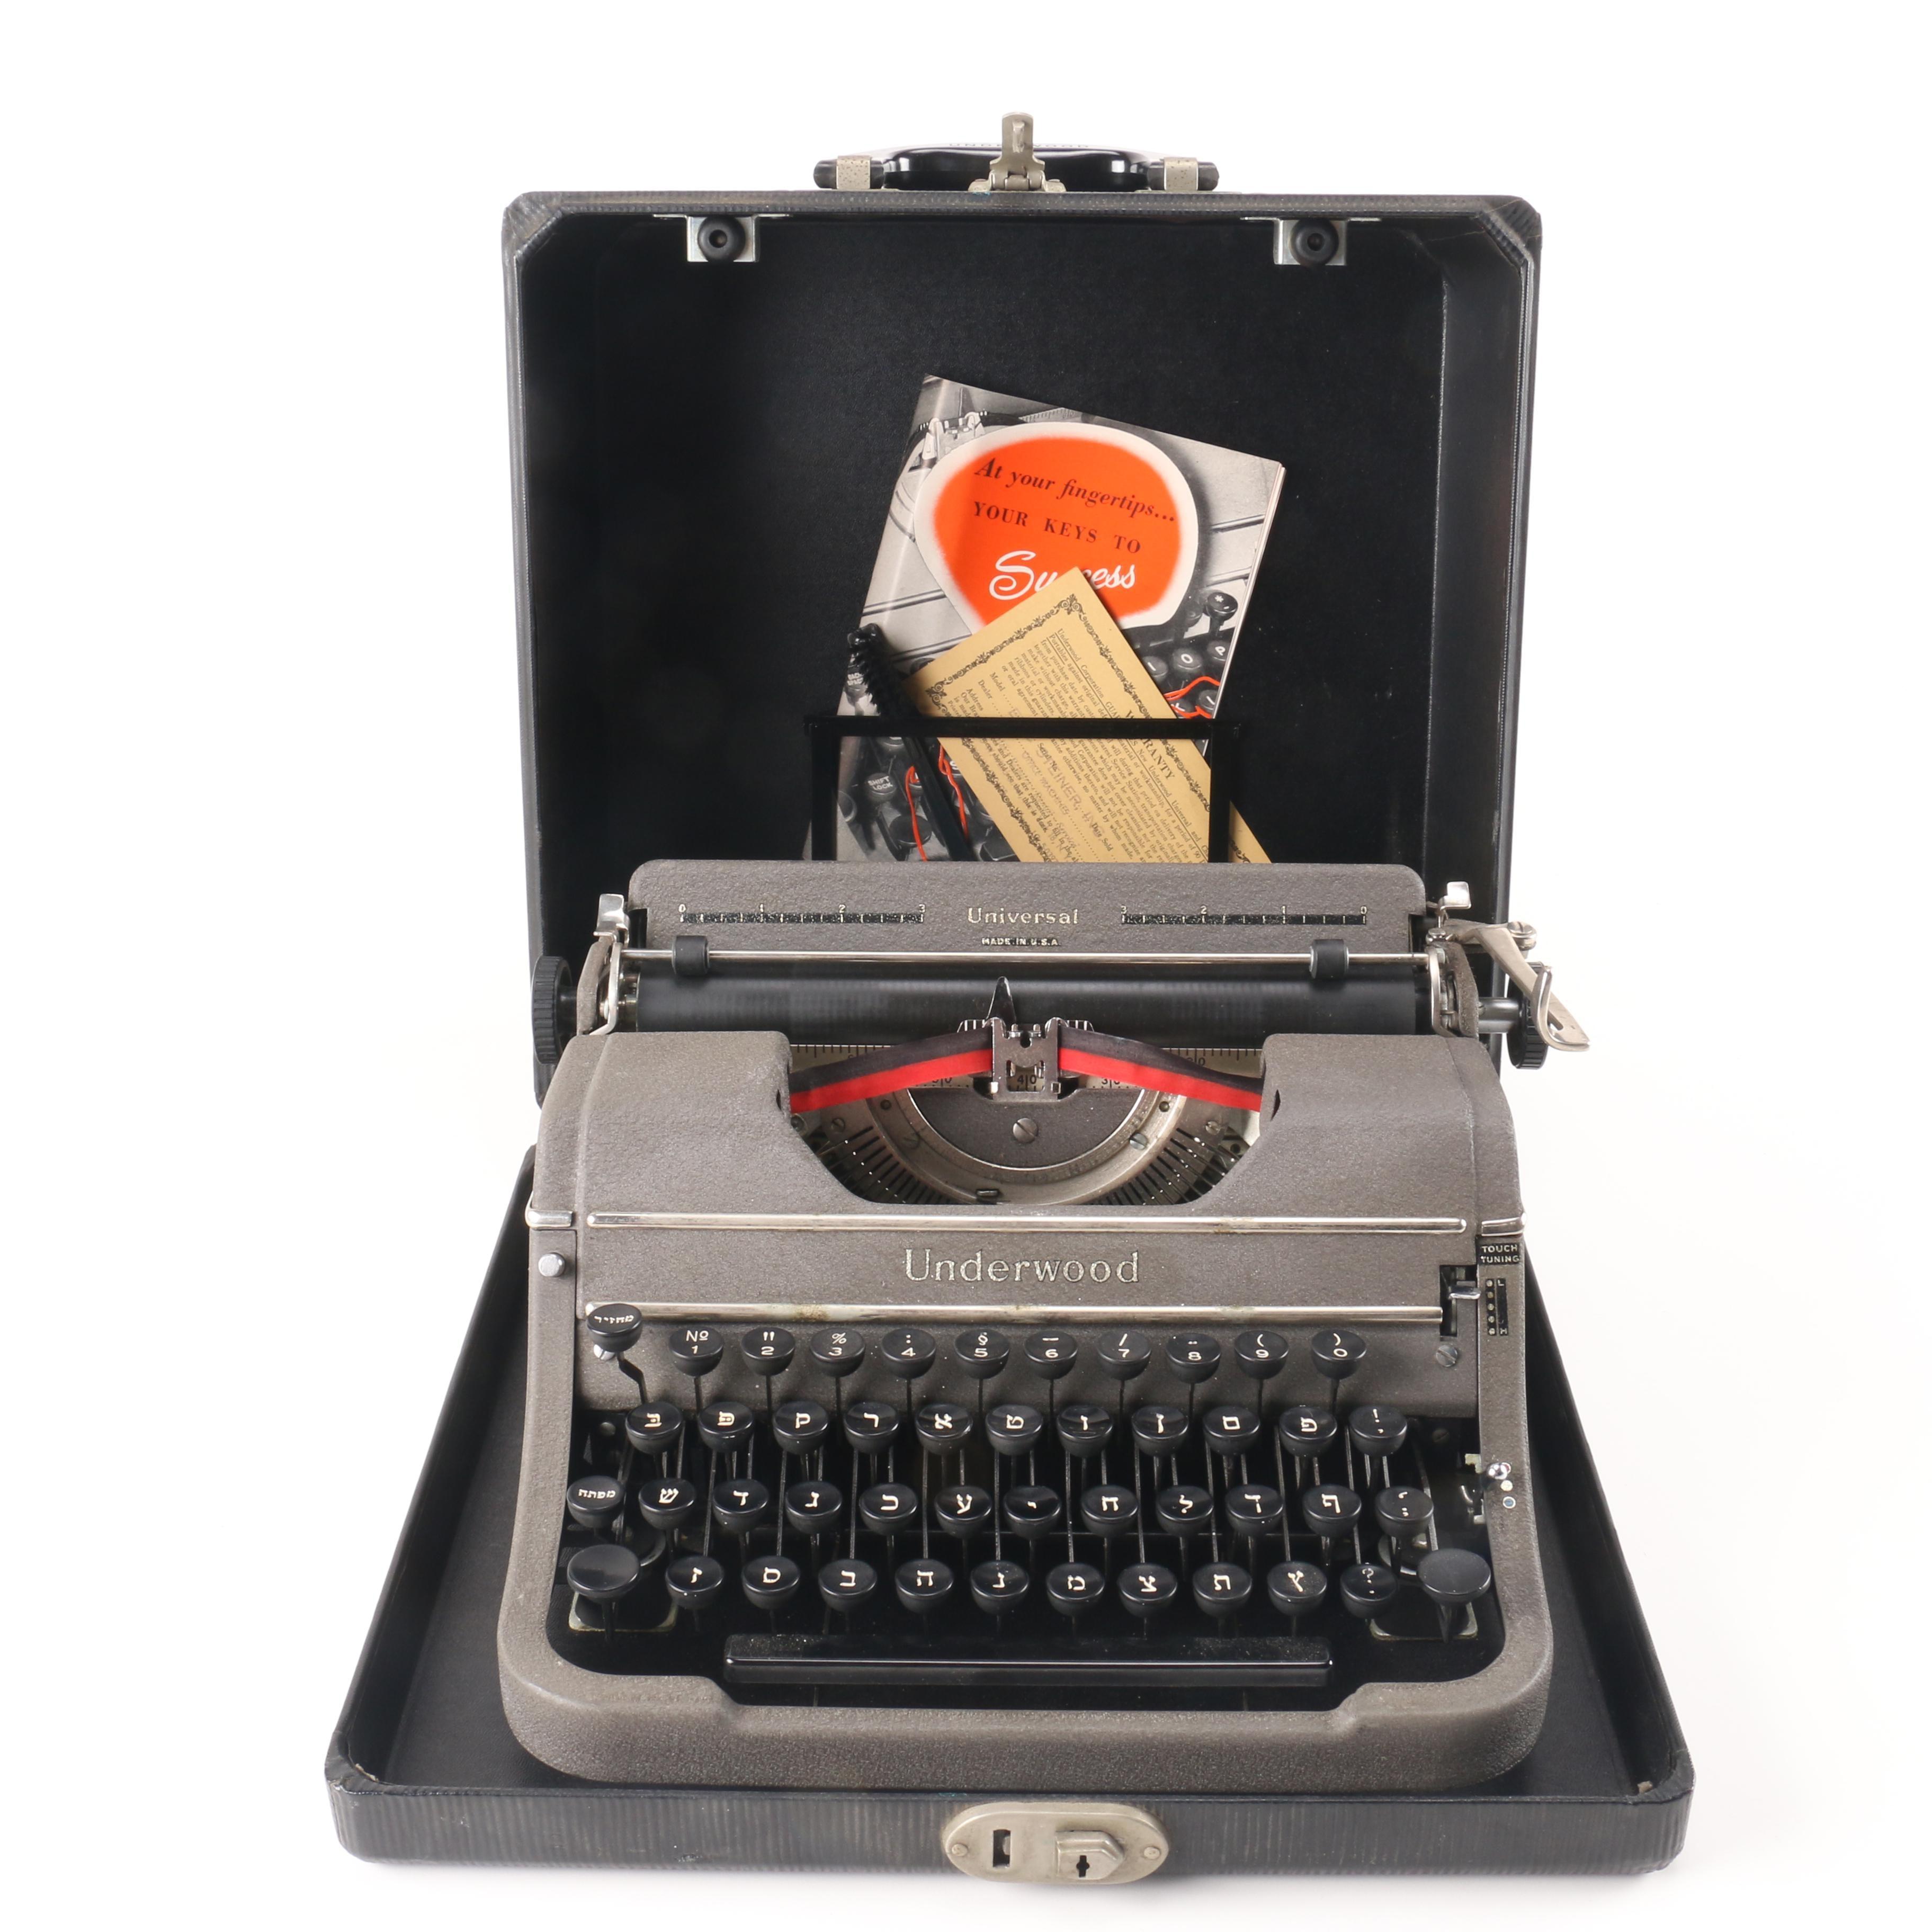 "Underwood ""Universal"" Hebrew Typewriter with Case, Circa 1930s-40s"